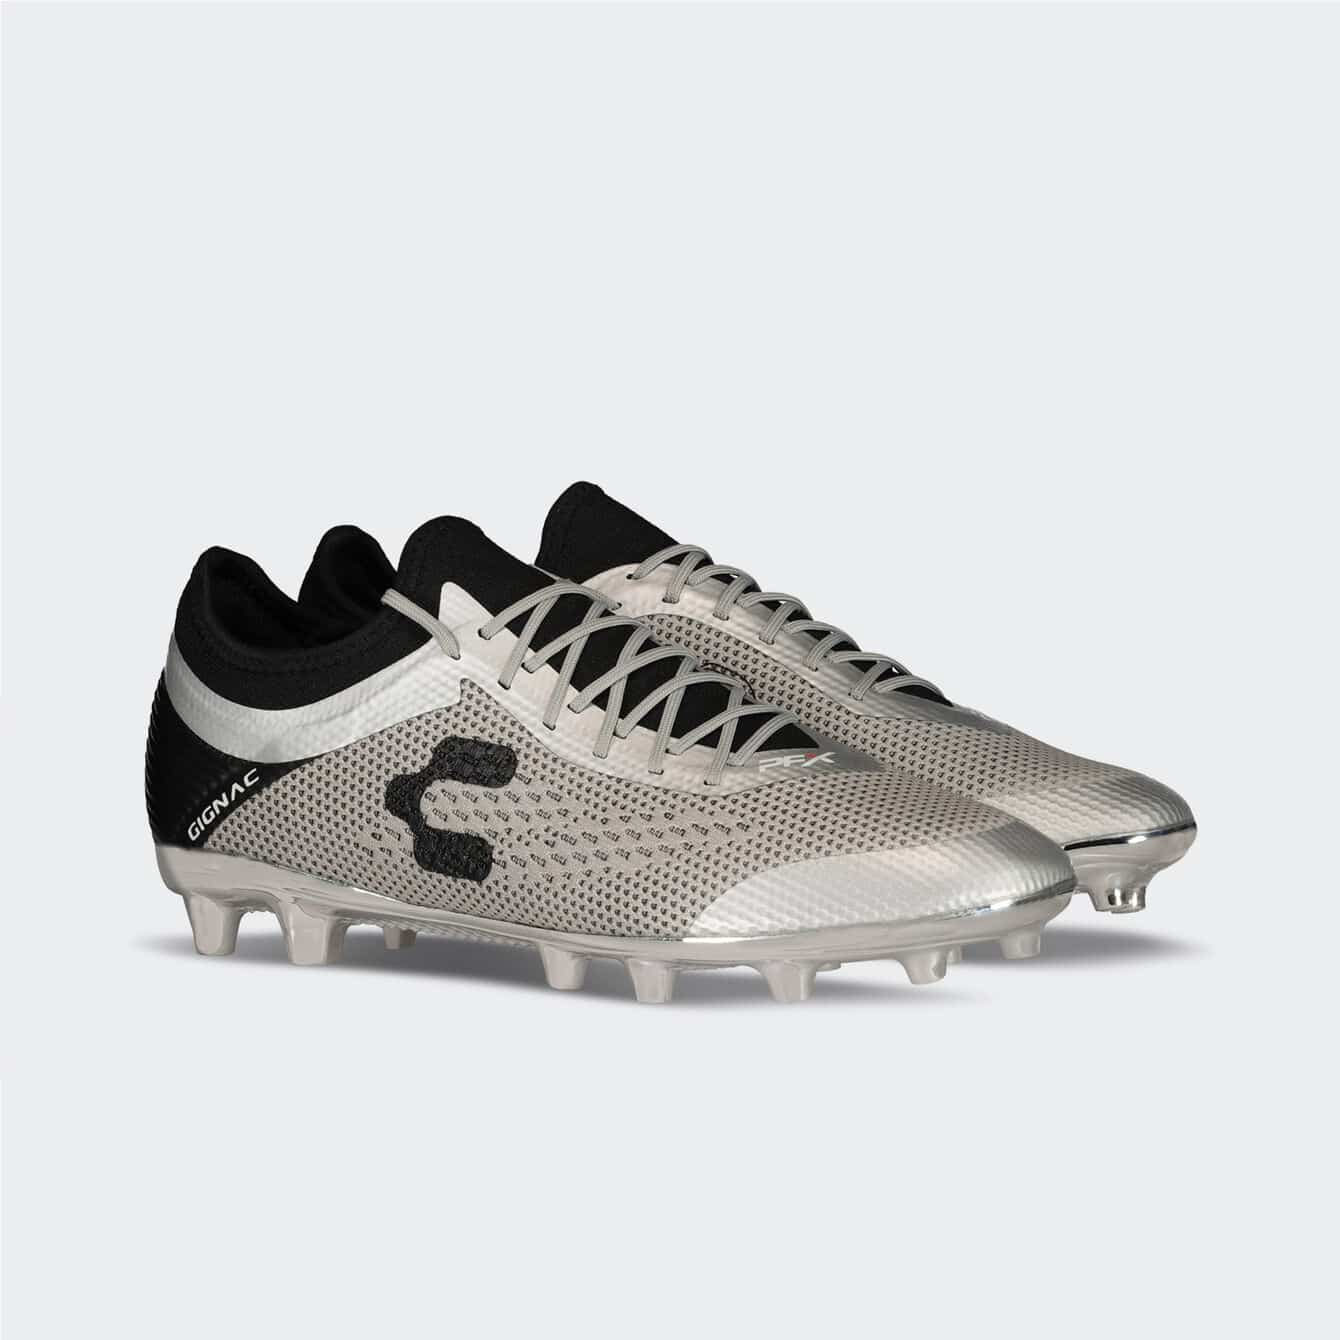 chaussures-andre-pierre-gignac-charly-futbol-pfx-4